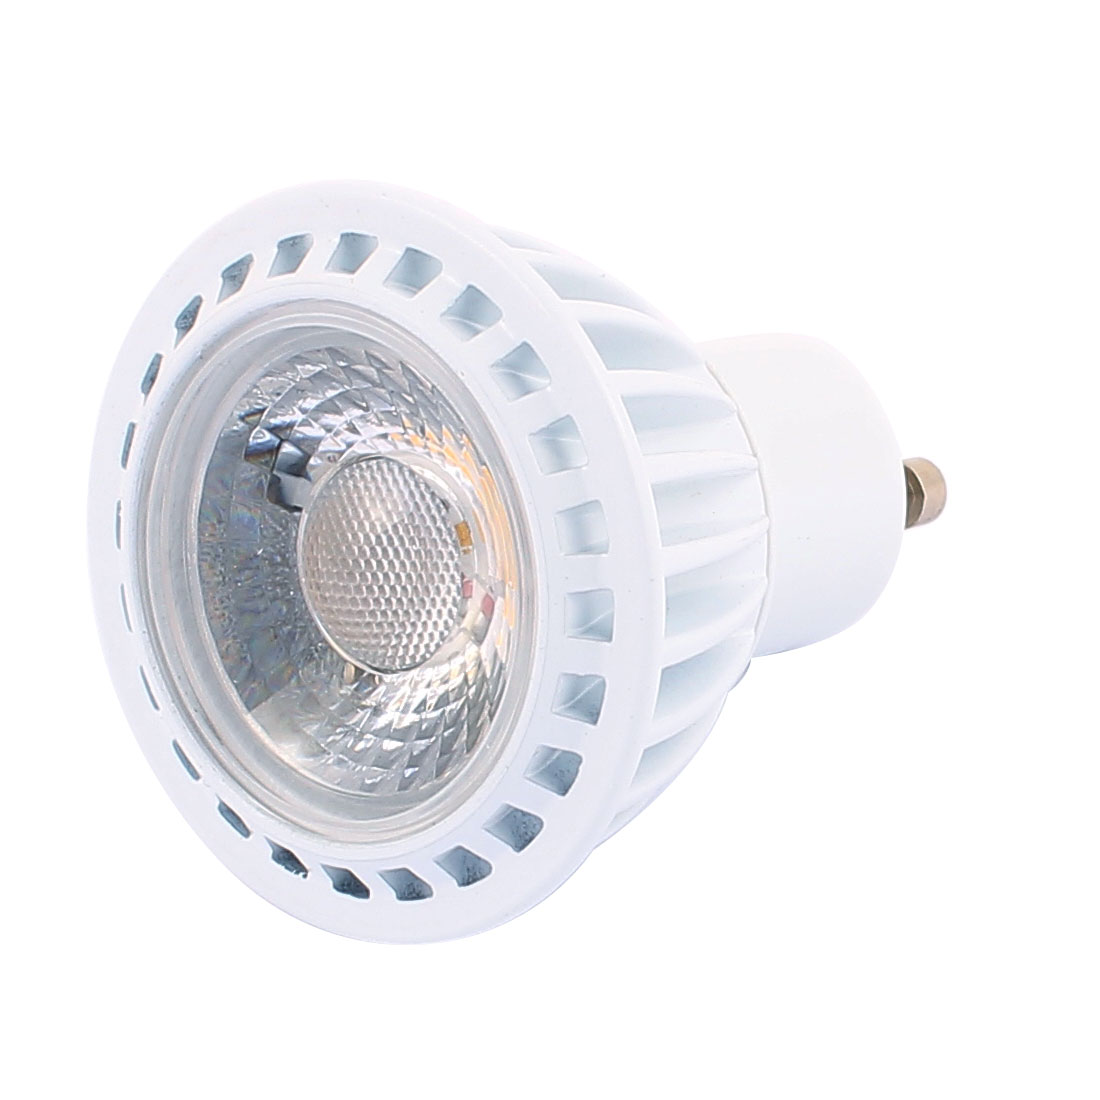 AC85-265V 3W GU10 COB Integrated Chip LED Spotlight Lamp Bulb Downlight Warm White